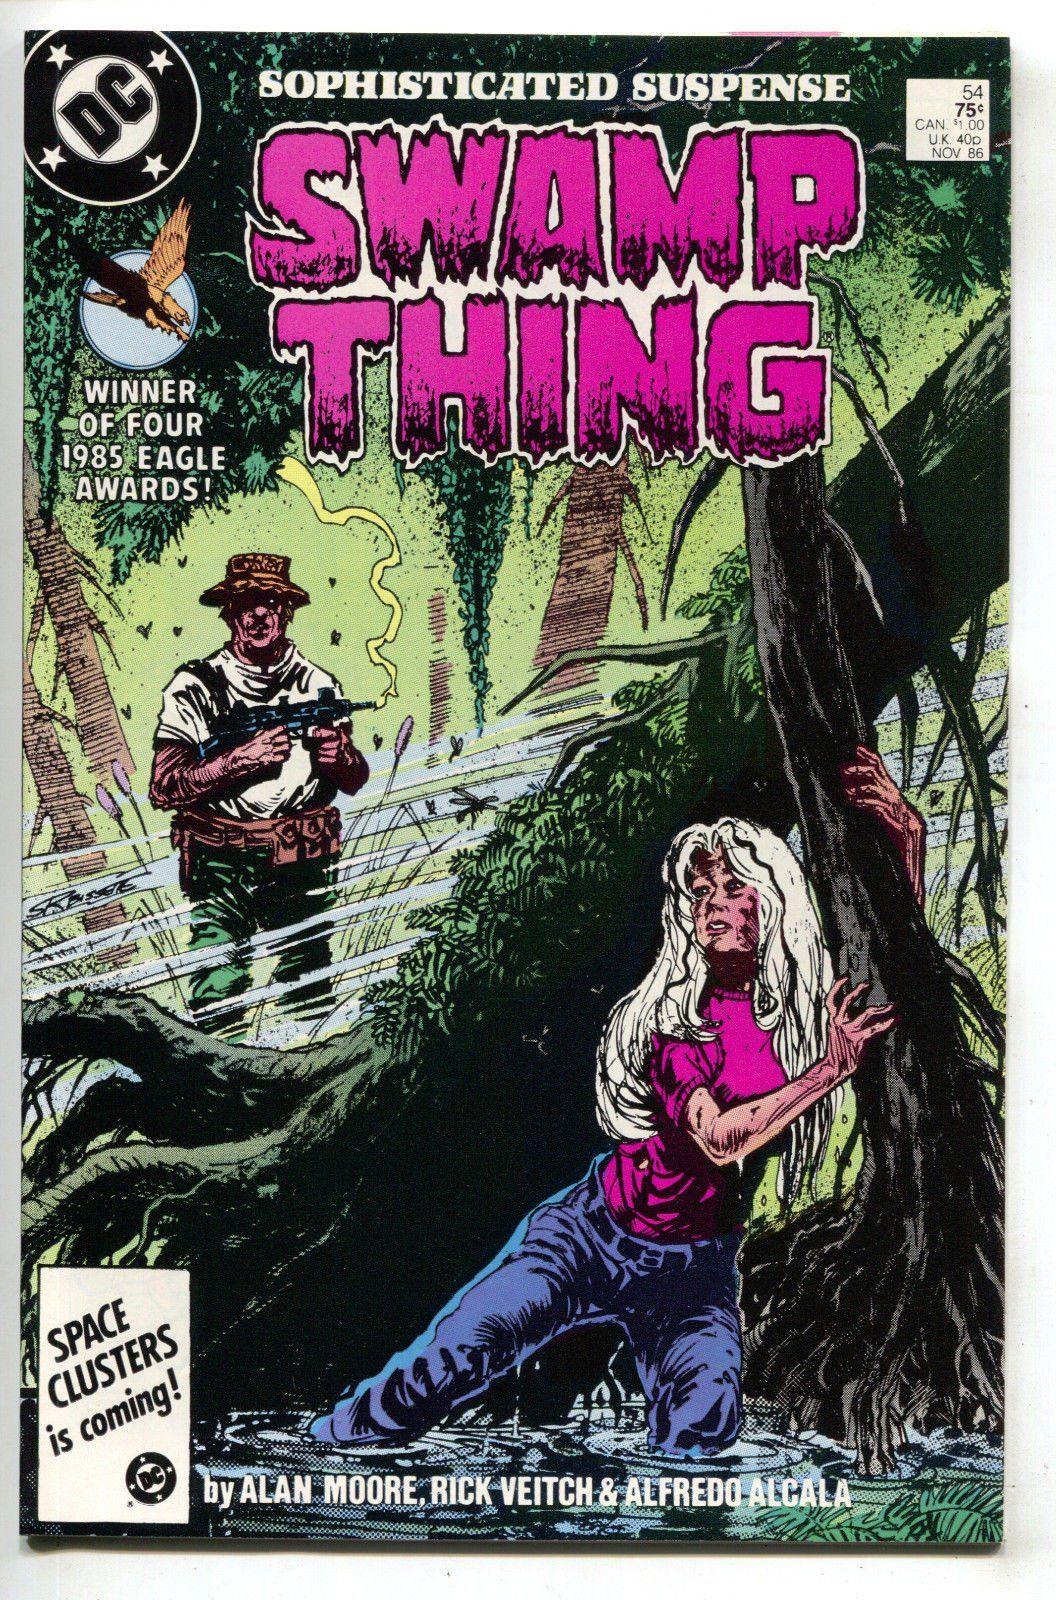 Swamp Thing Bissette Moore Veitch Alcala Totleben #59 DC Comics April 1987 NM